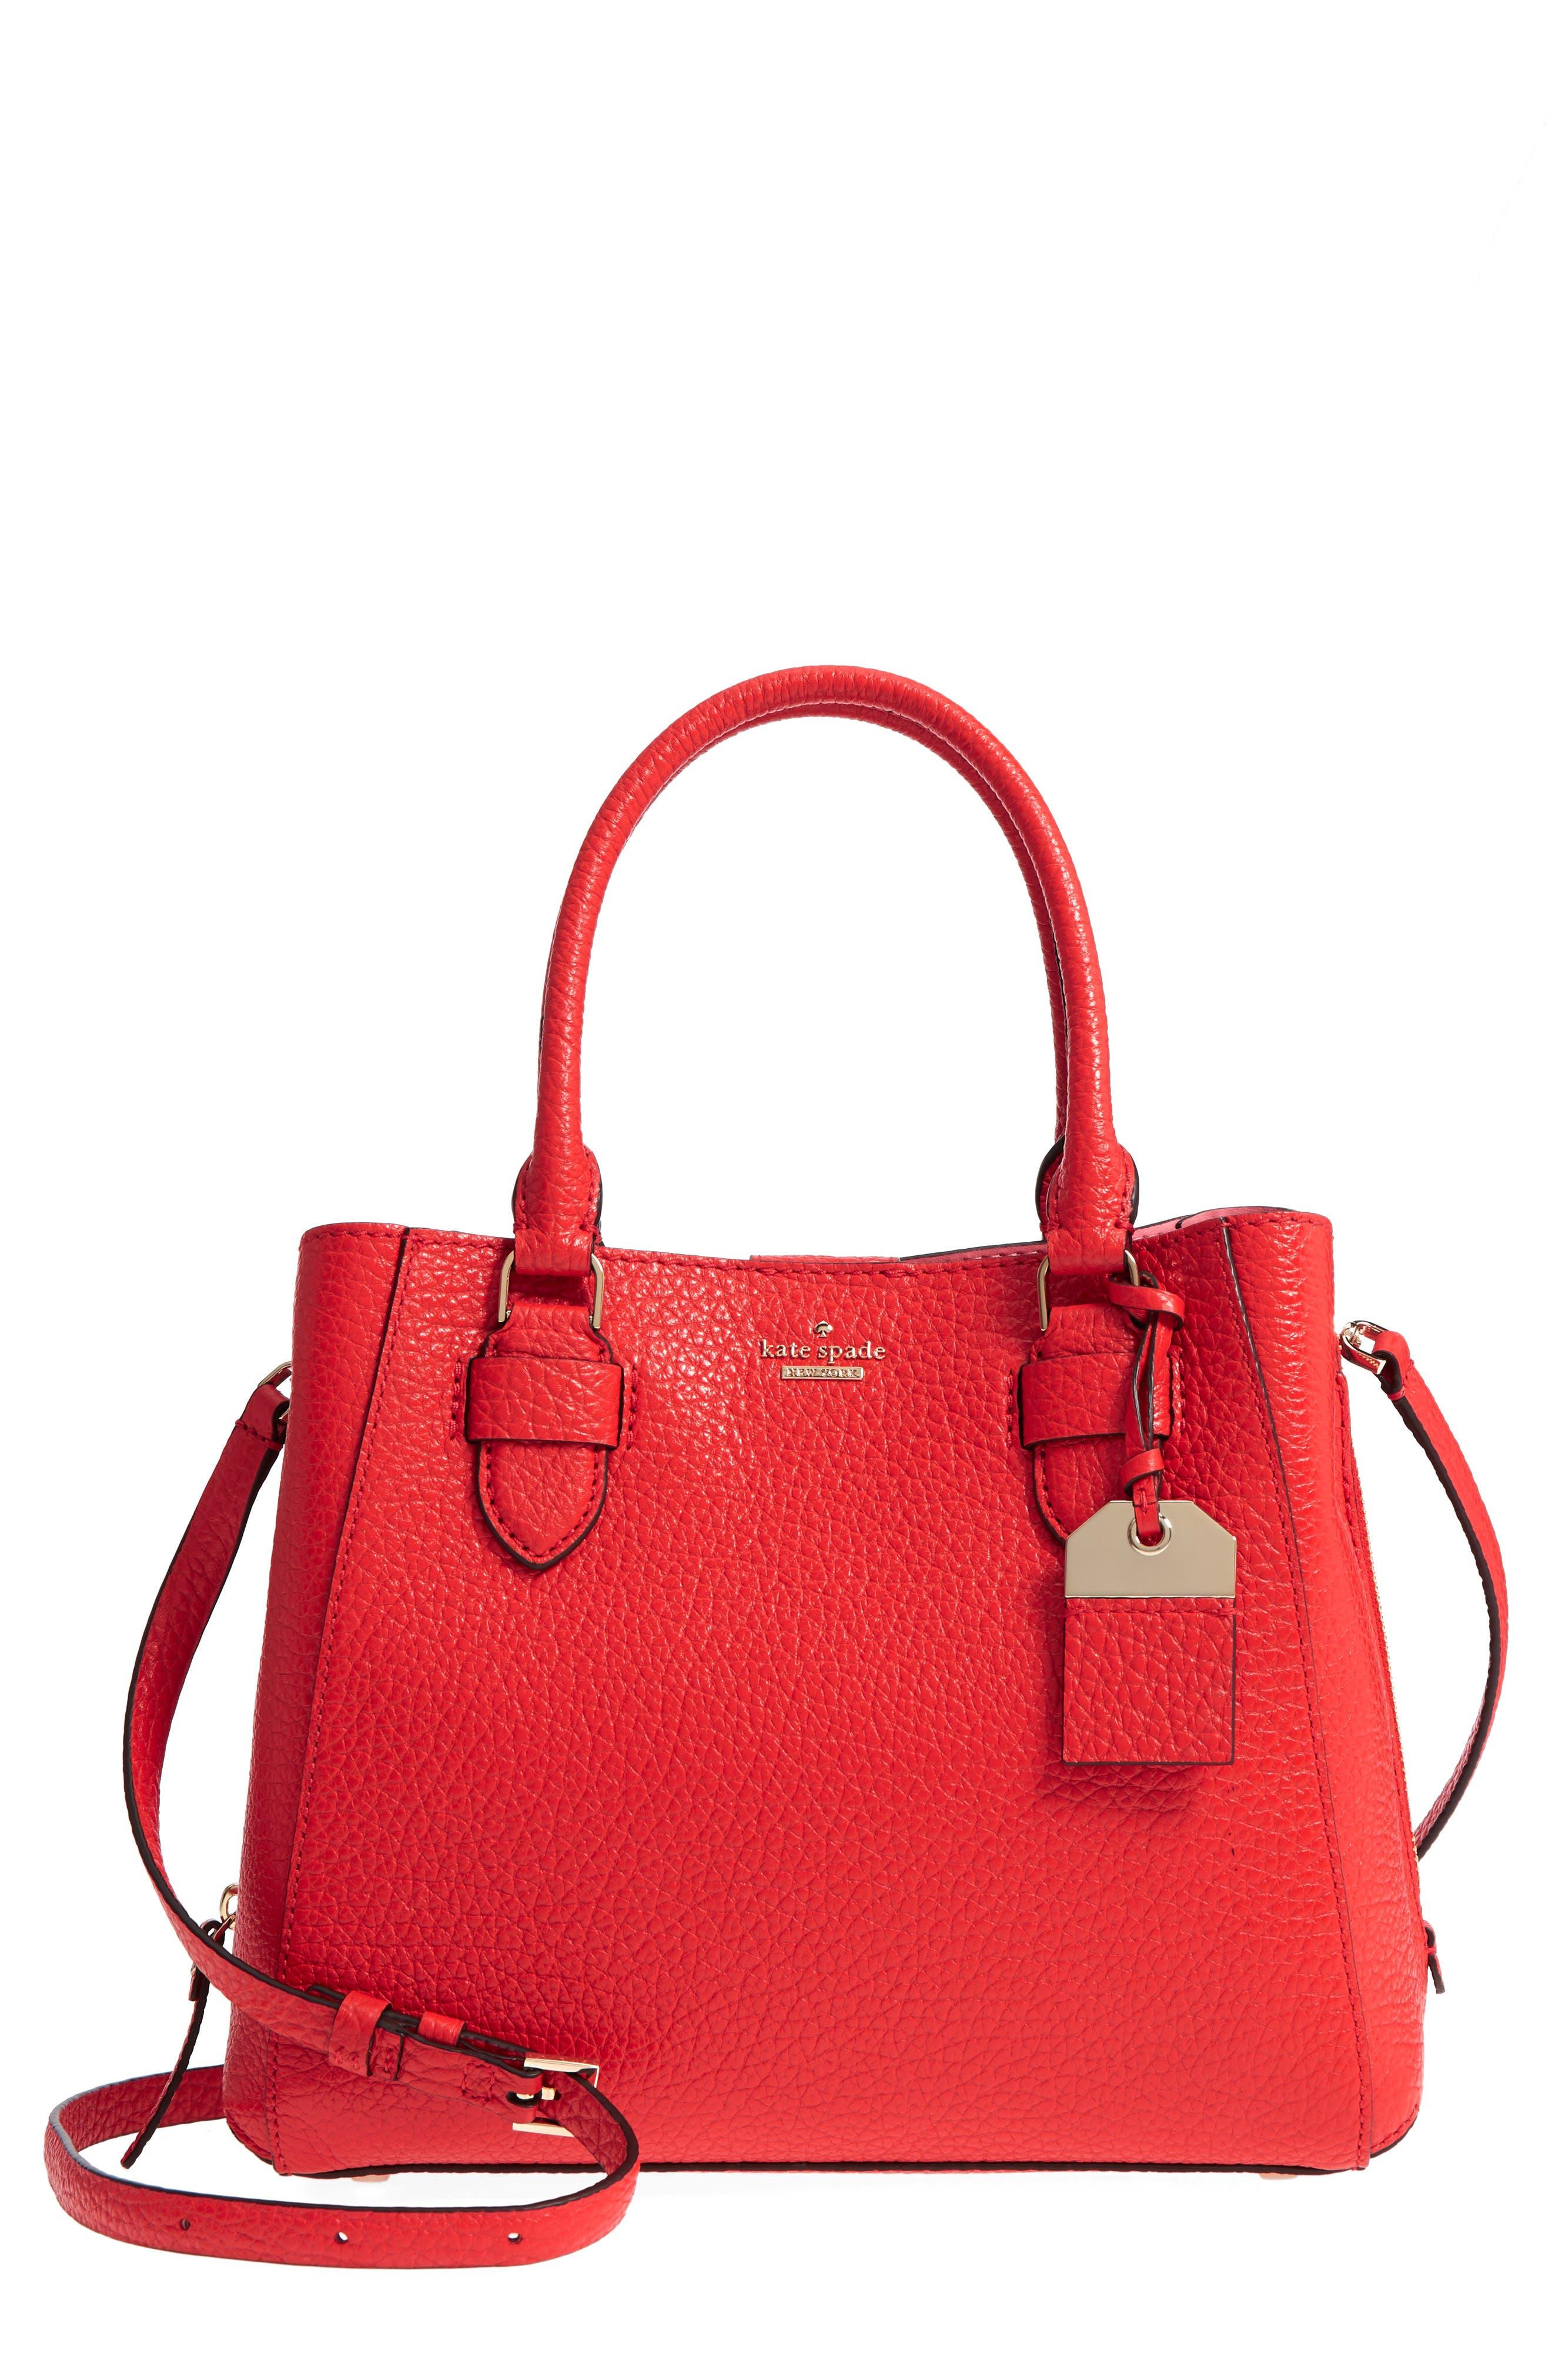 carter street - aliana leather satchel,                             Main thumbnail 1, color,                             Picnic Red